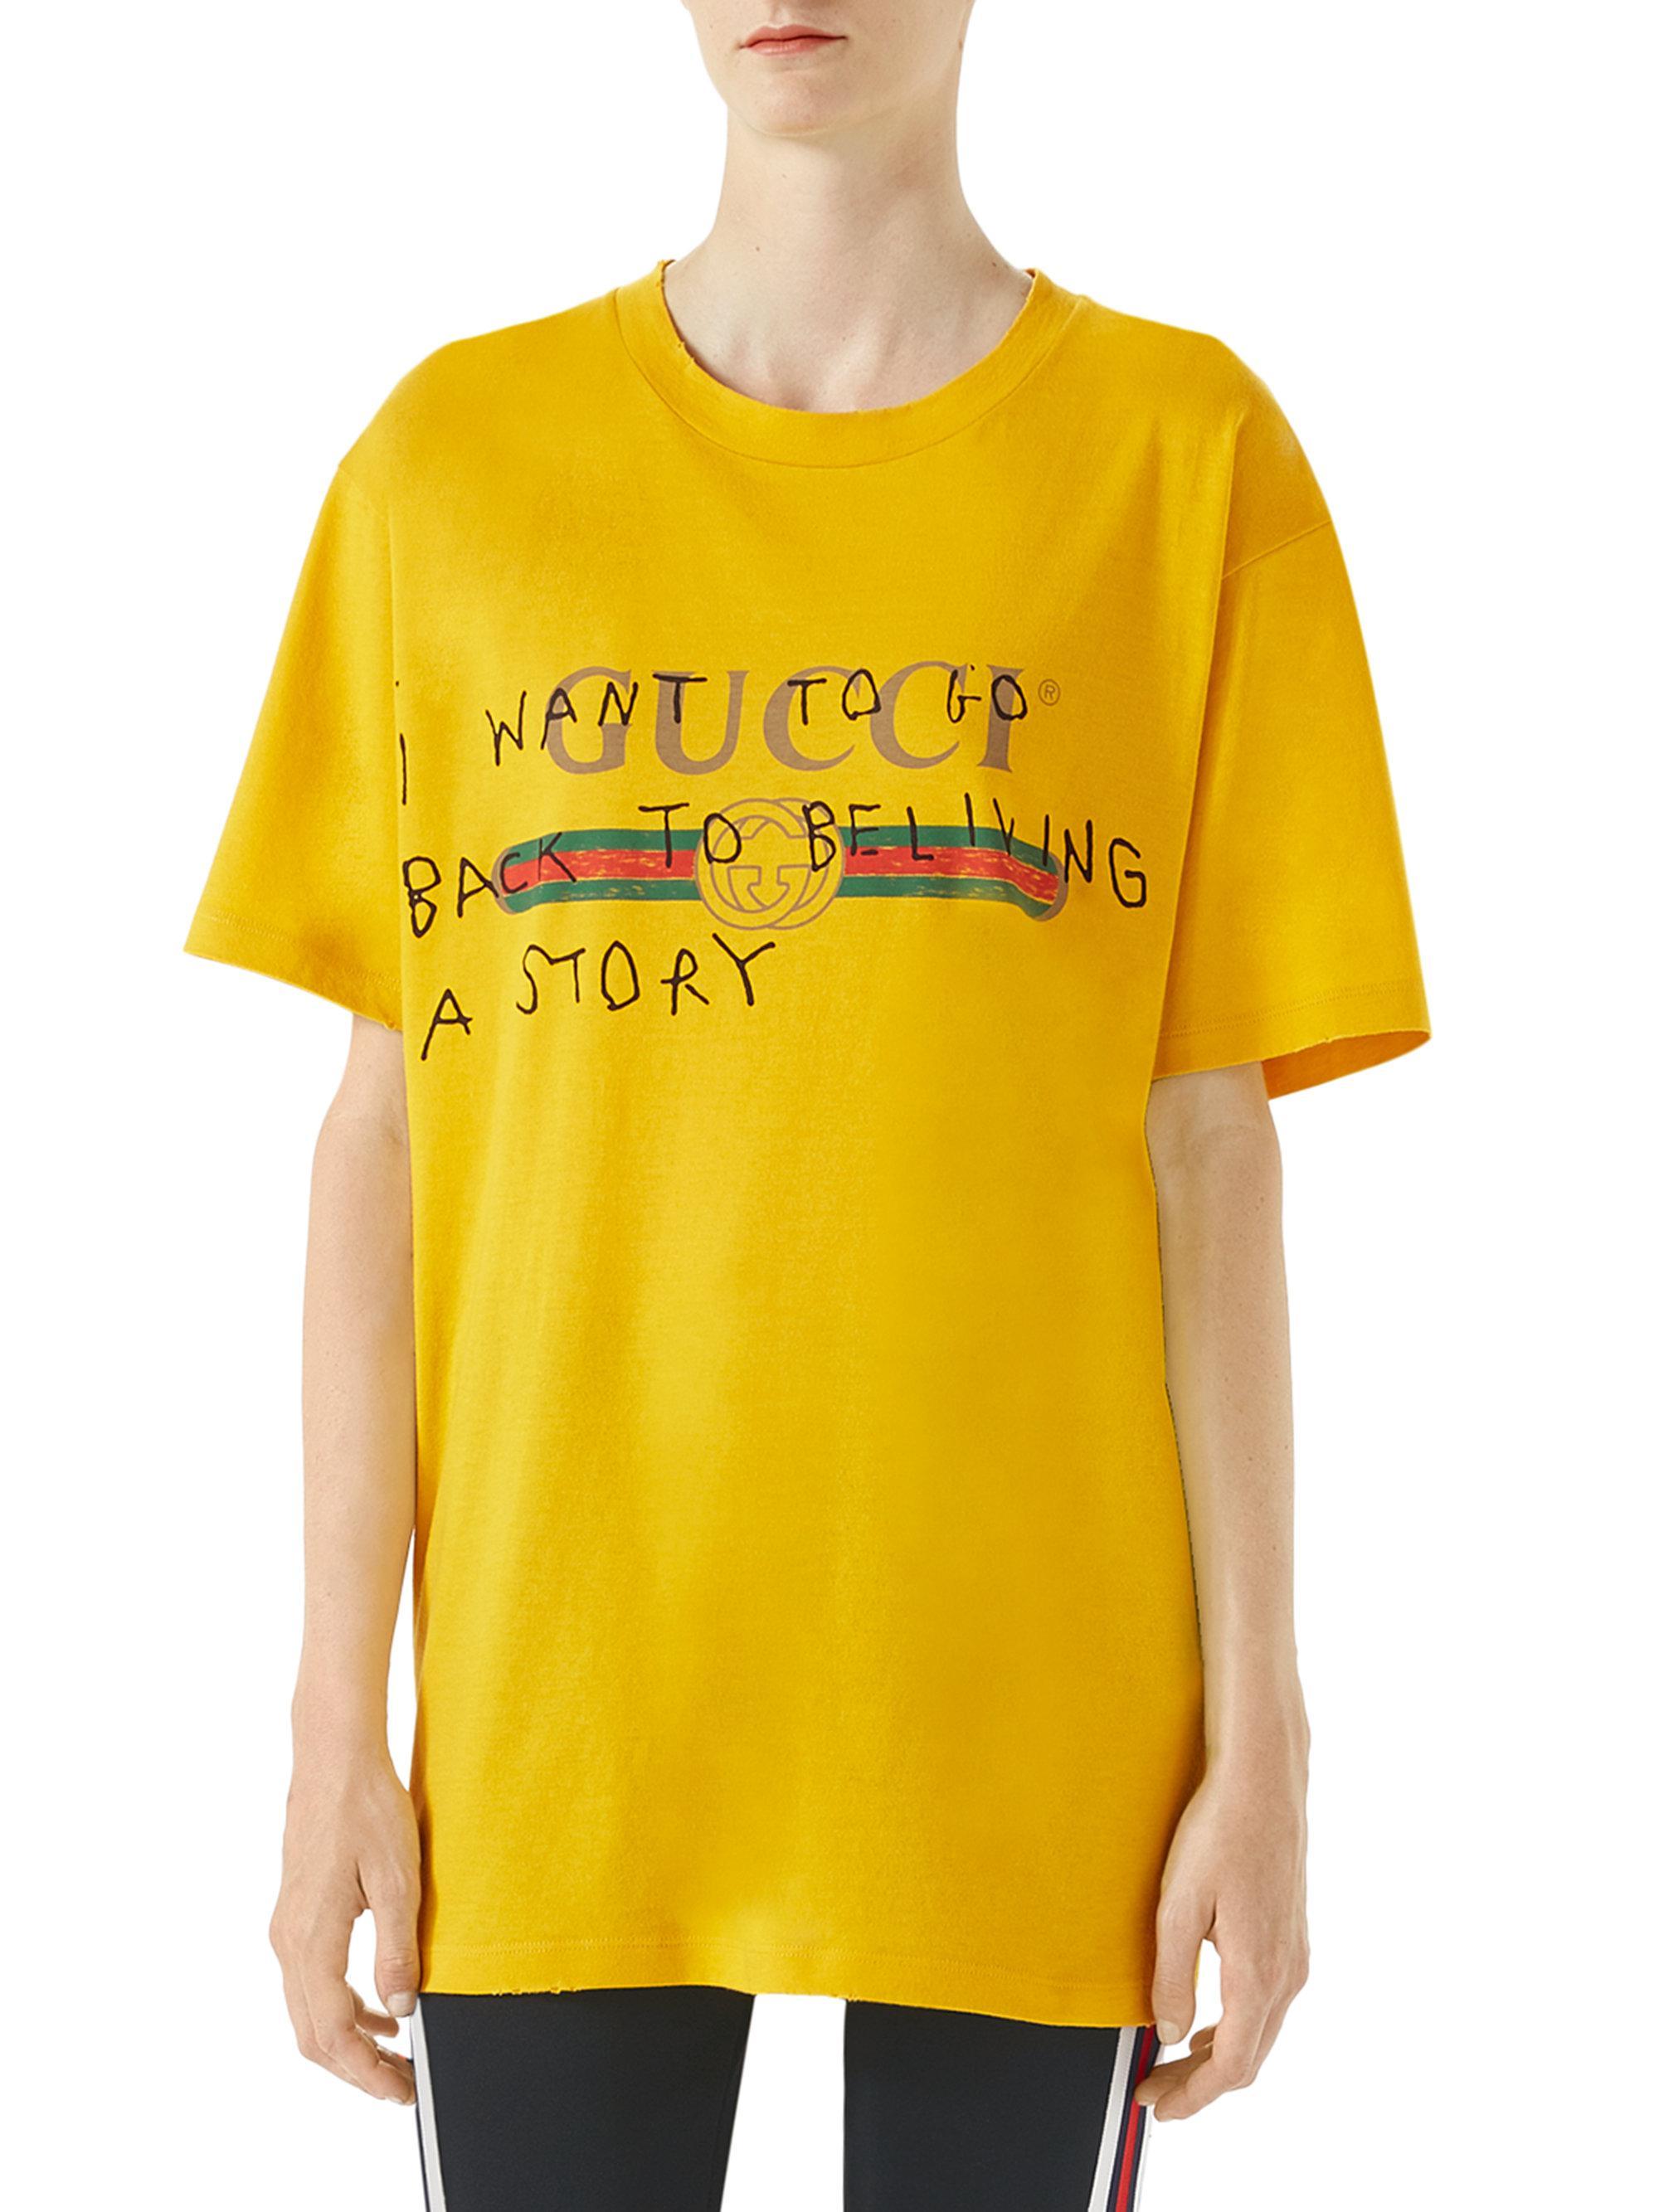 Lyst - Gucci Logo Writing T-shirt in Yellow a660008db1a8